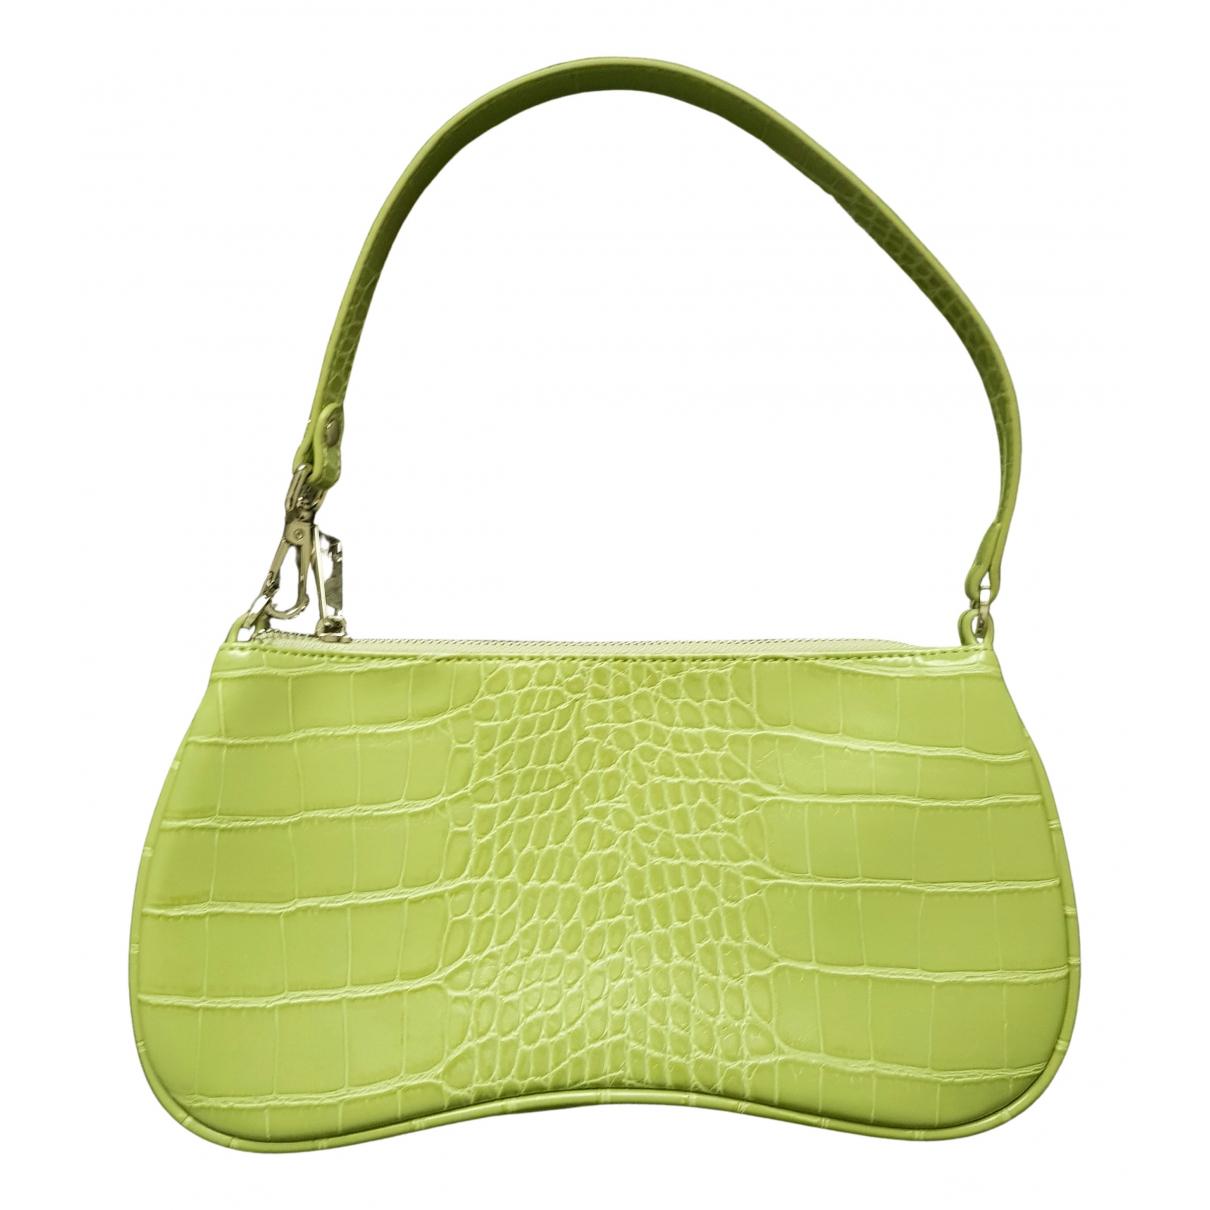 Jw Pei N Green handbag for Women N